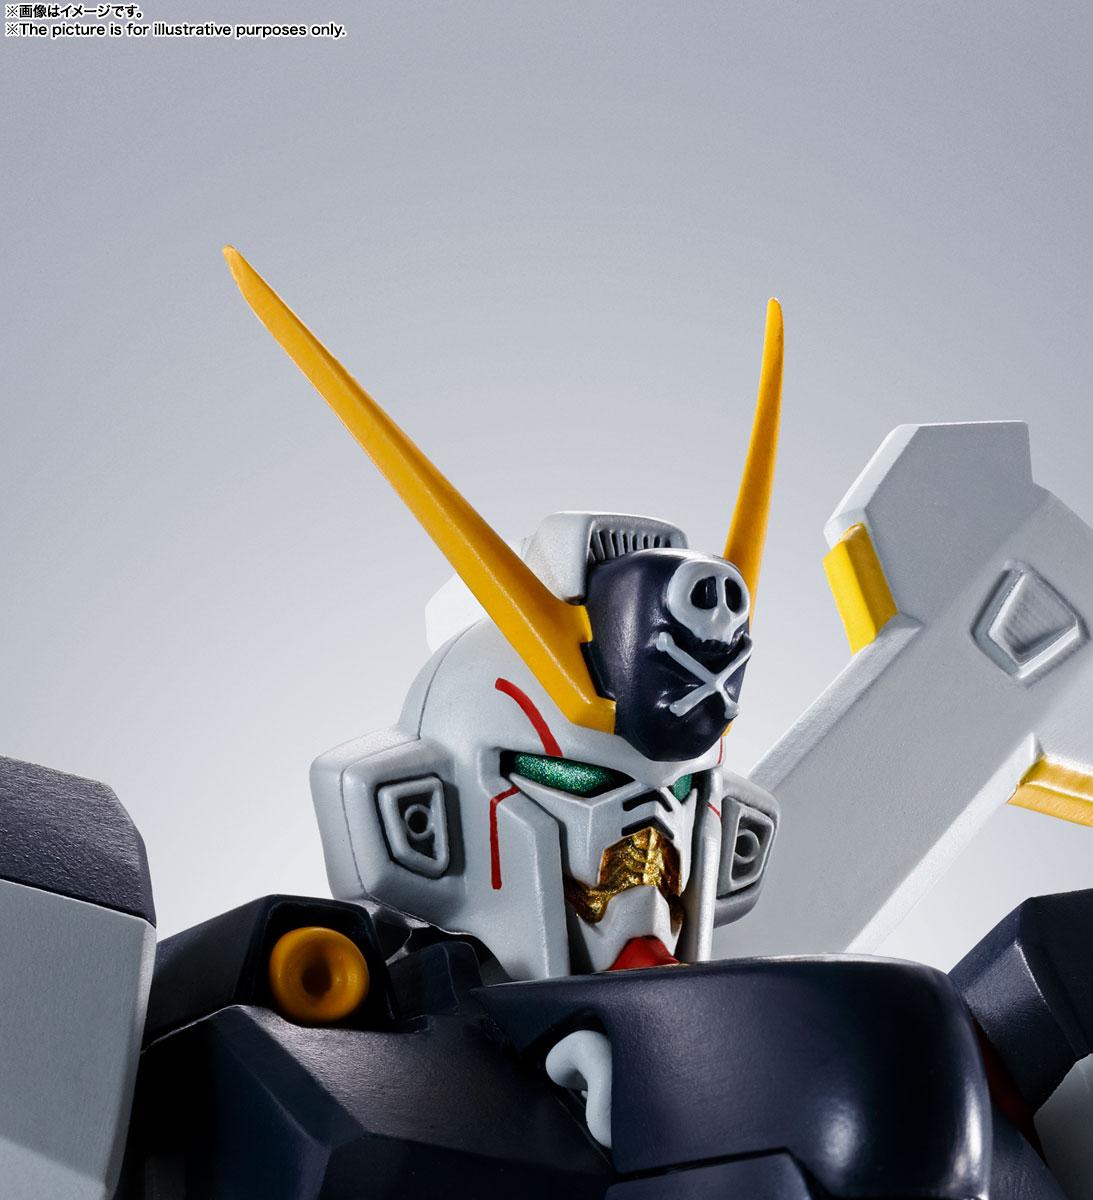 ROBOT魂〈SIDE MS〉『ガンダムX1/X1改 EVOLUTION-SPEC』クロスボーン・ガンダム 可動フィギュア-010